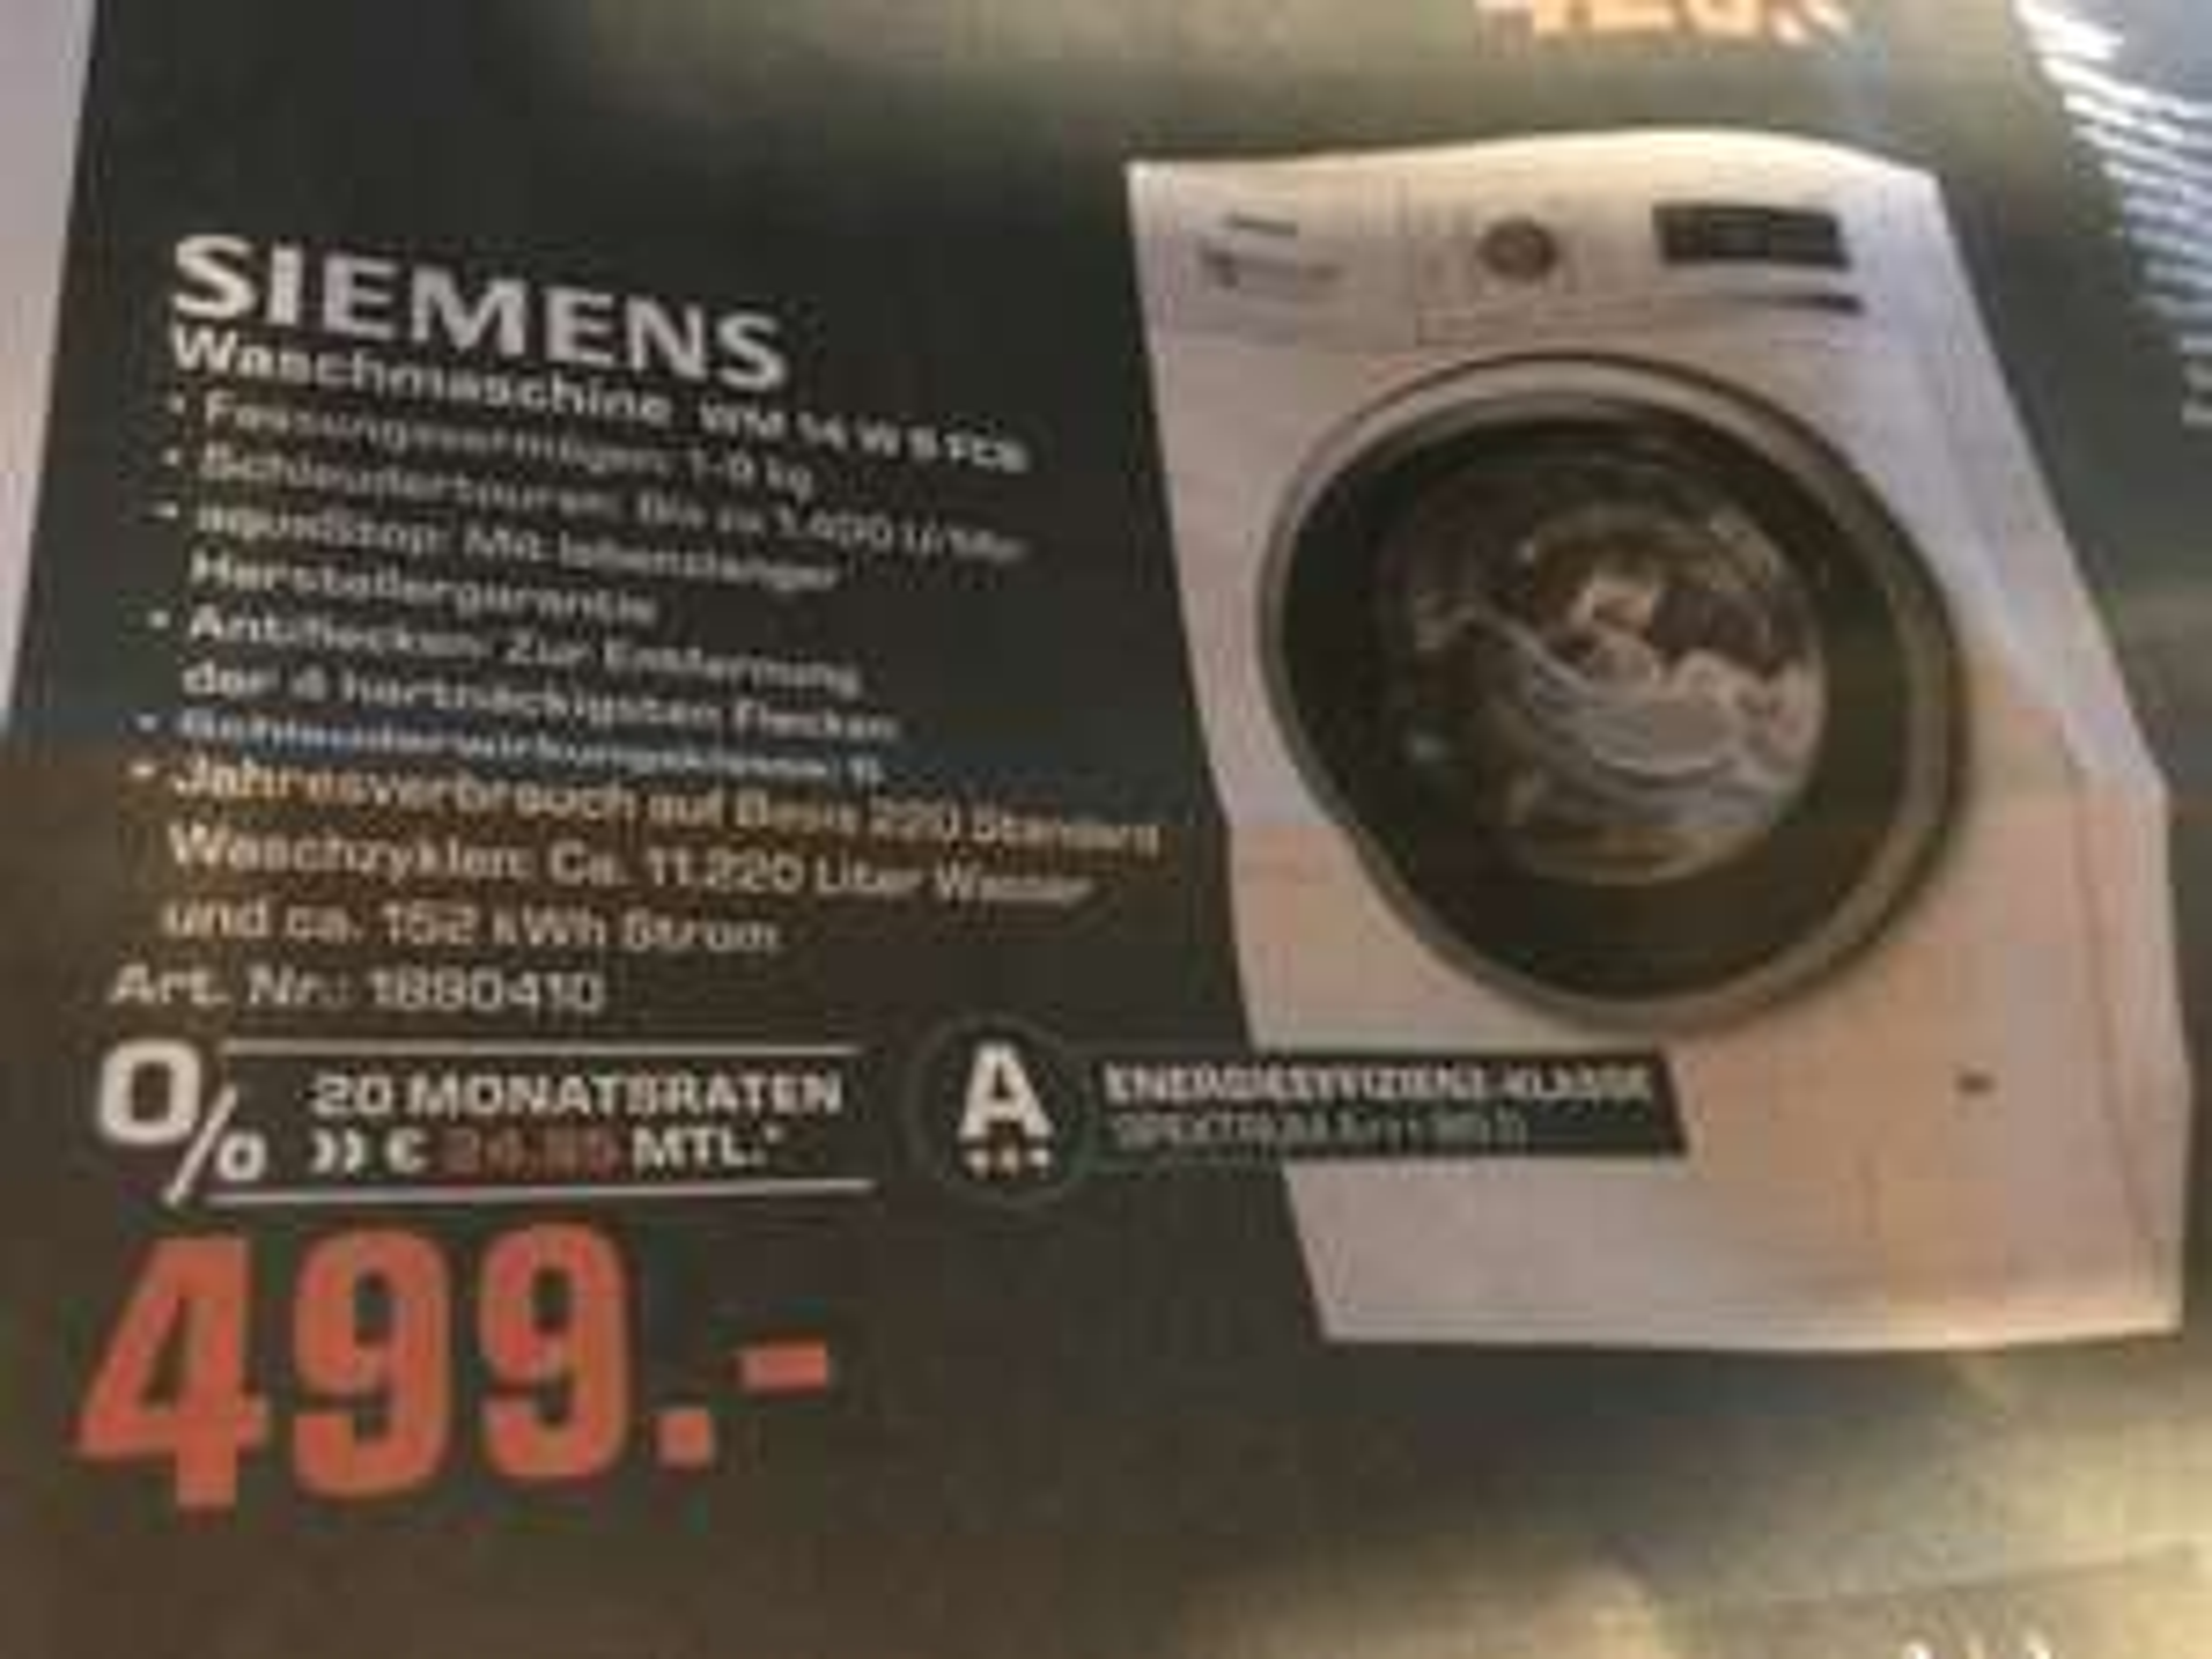 Siemens Waschmaschine (Vollautomat) WM14W5FCB / Saturn Duisburg / LOKAL